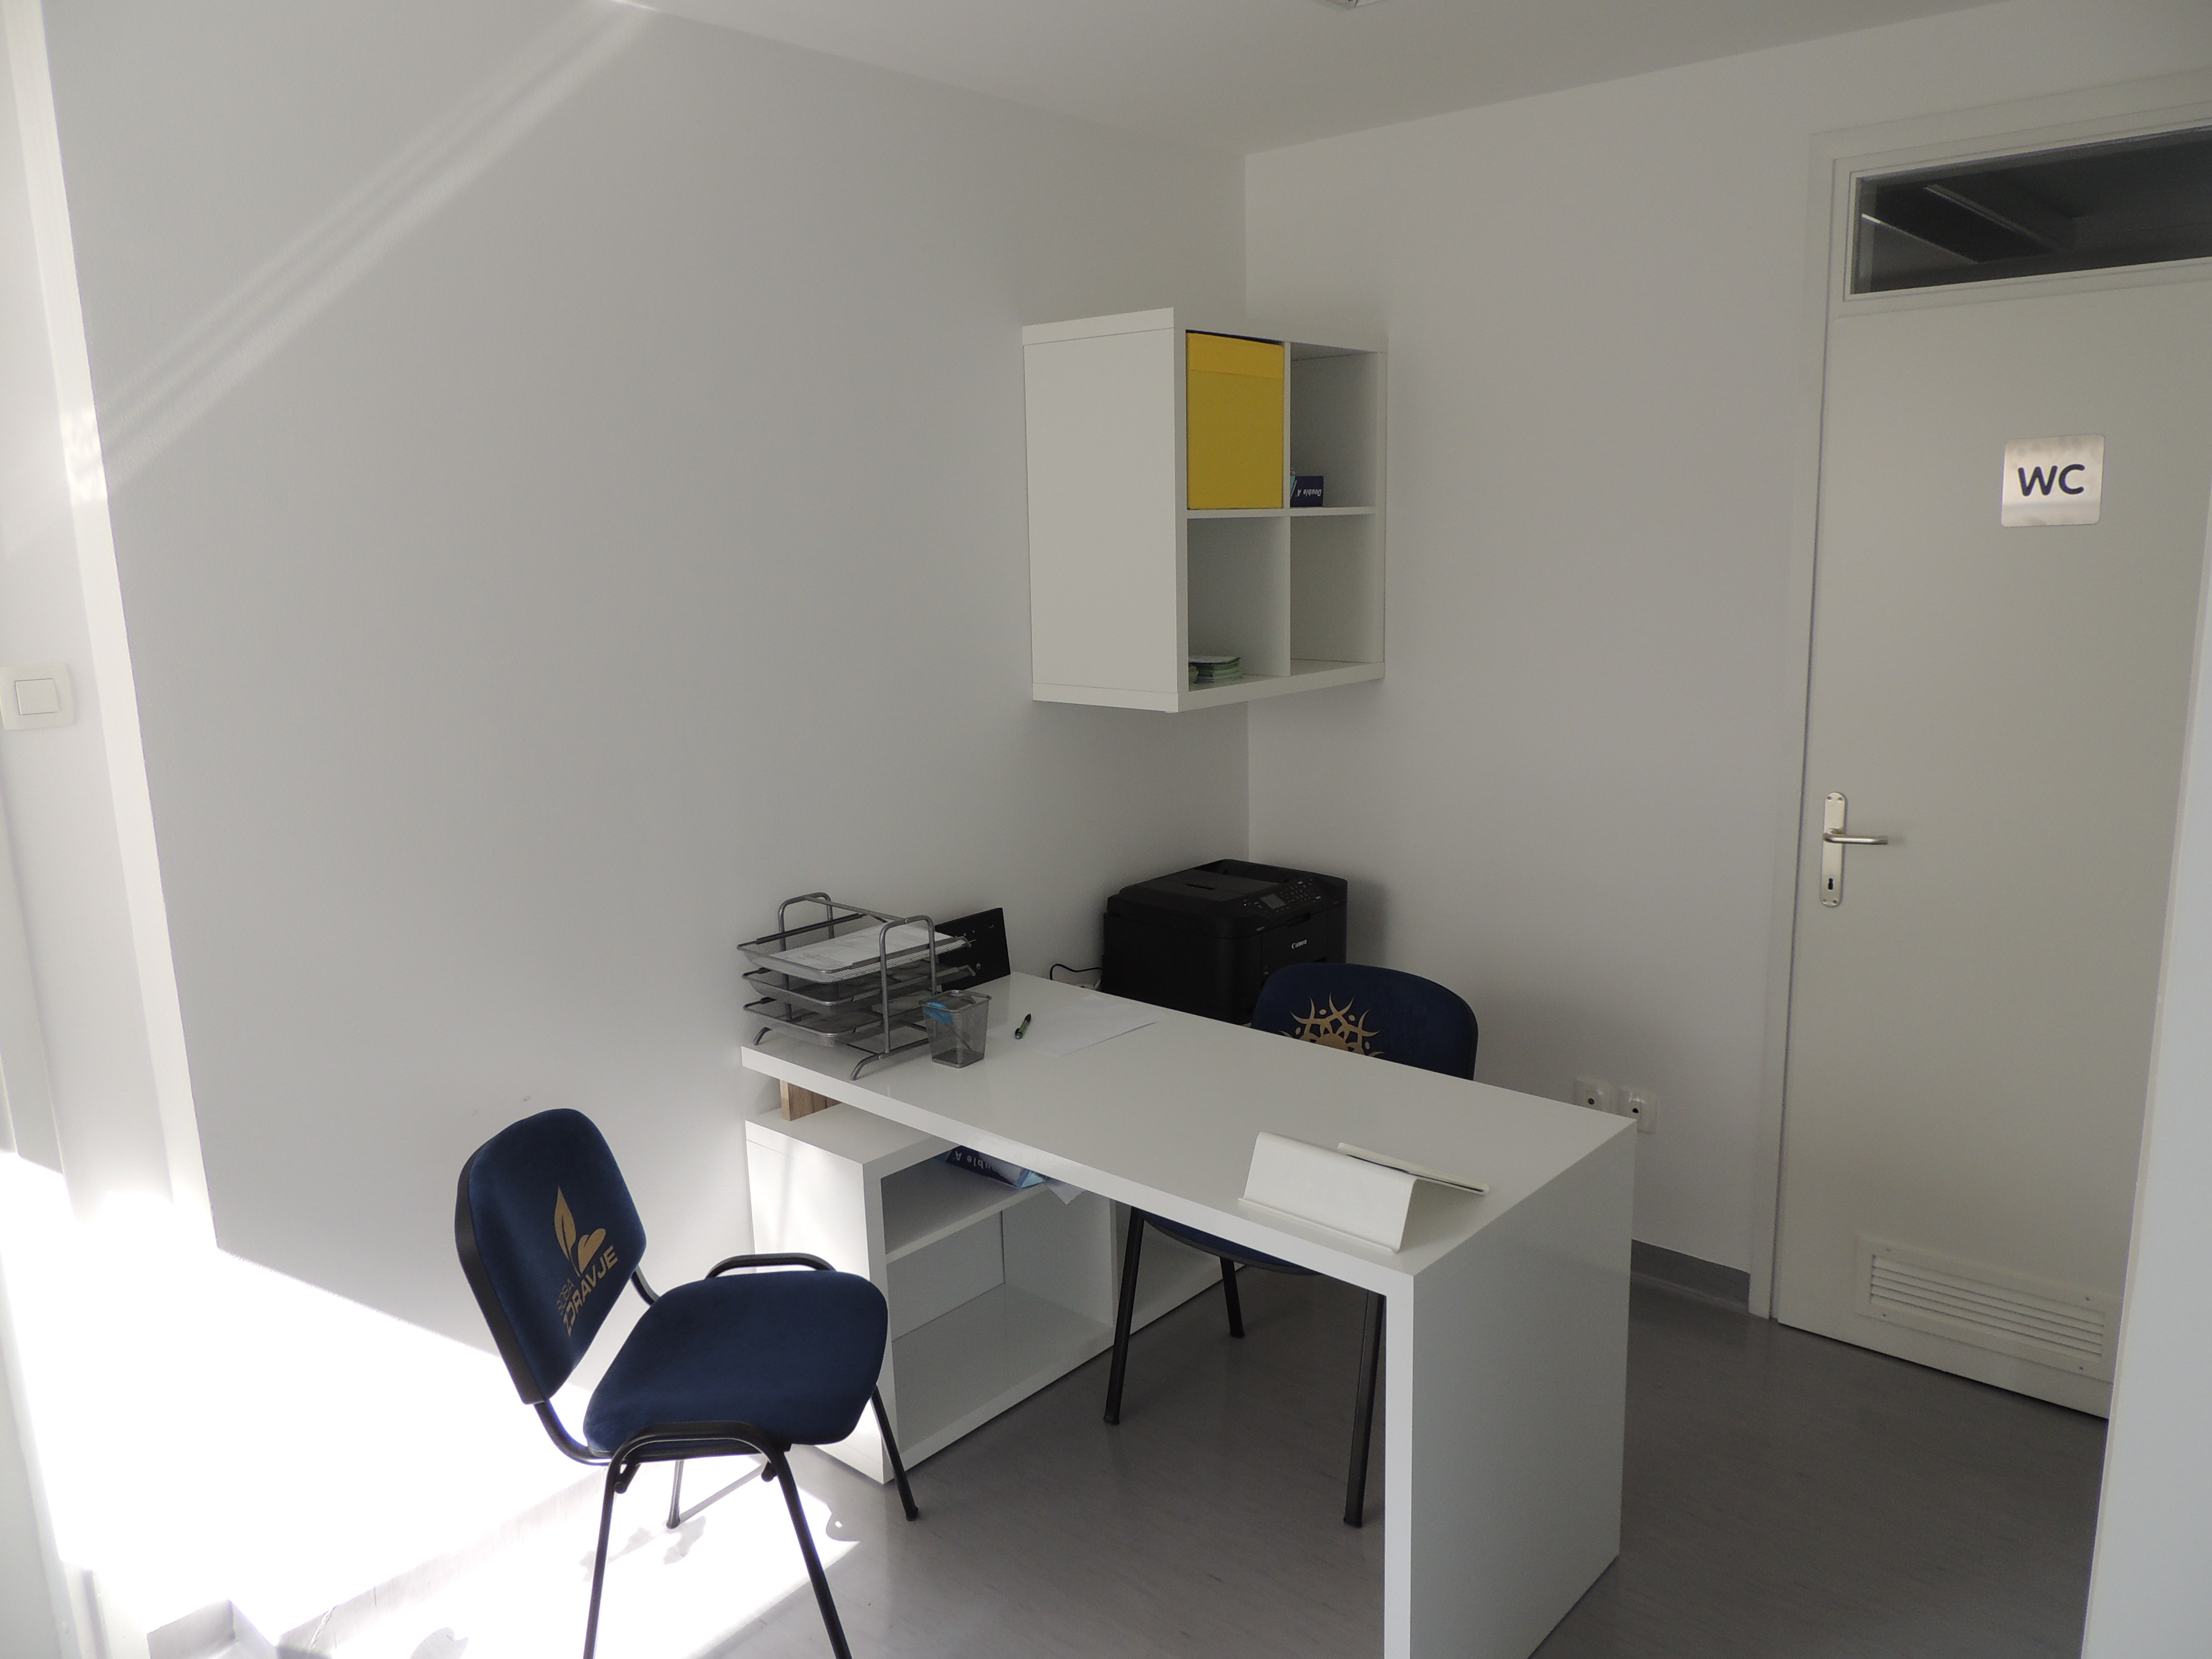 Prostori v ordinaciji Maribor